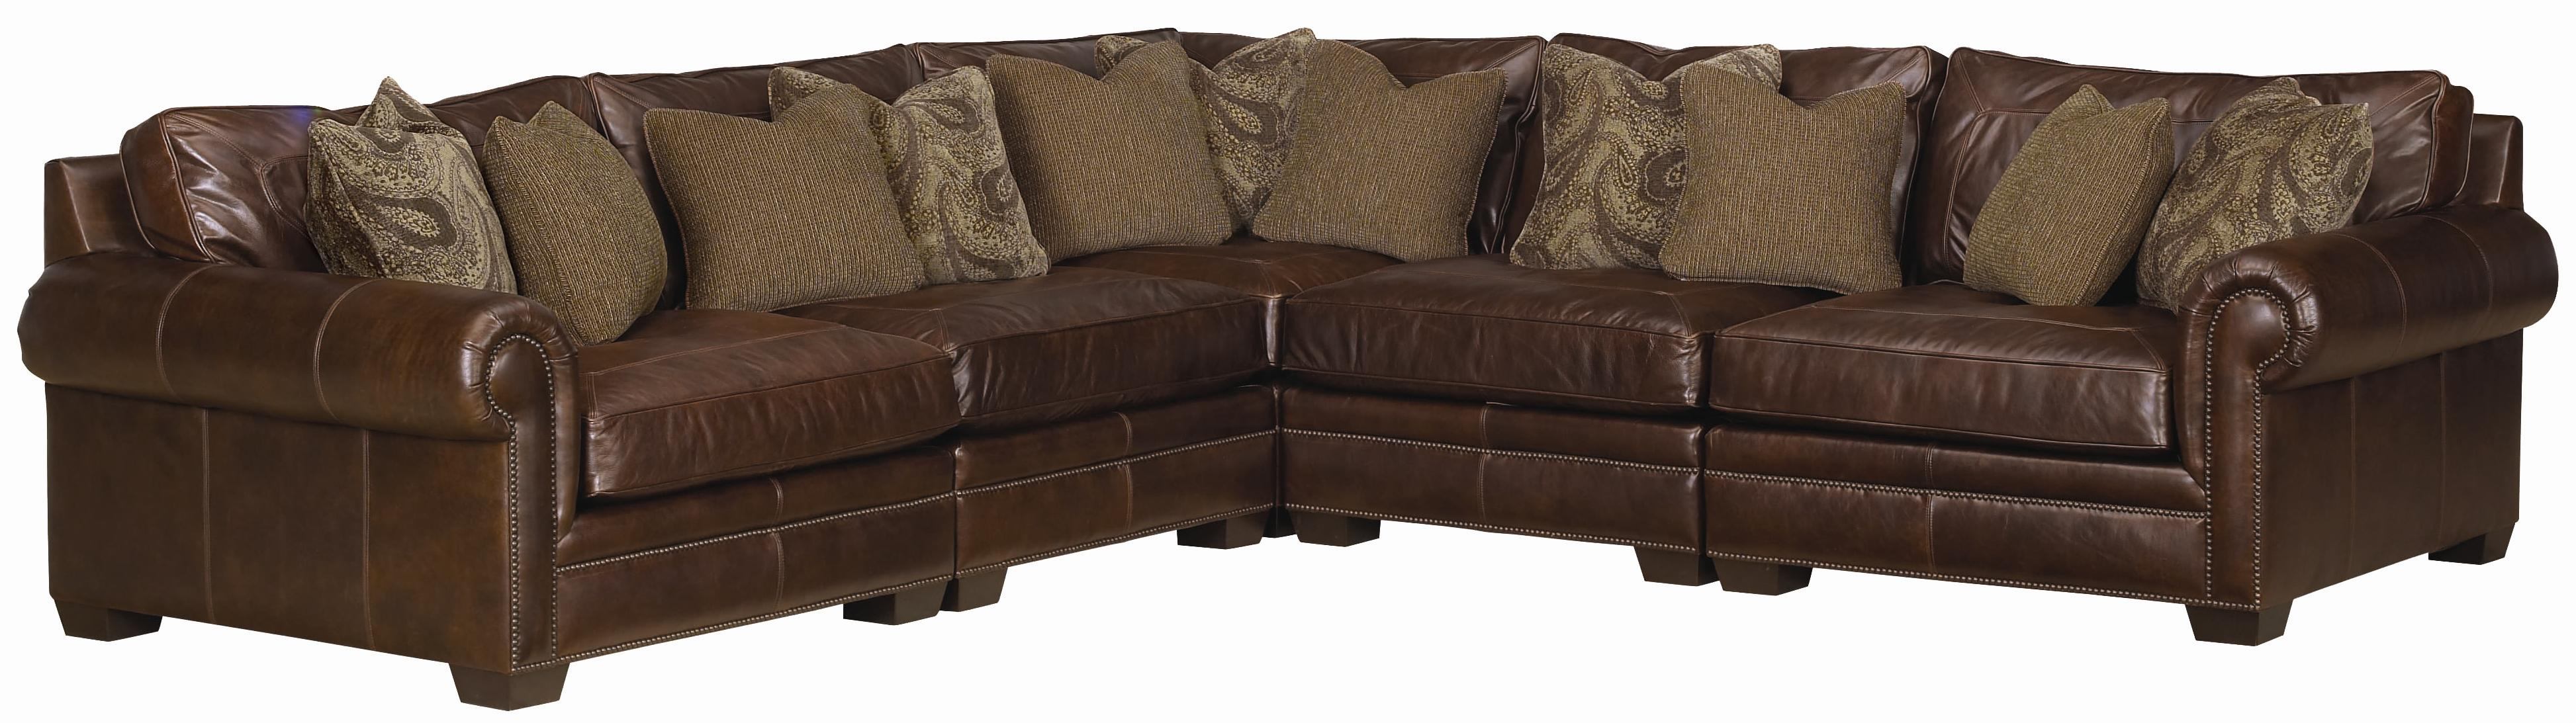 Bernhardt grandview 5 piece traditional sectional sofa for Bernhardt furniture sectional sofa